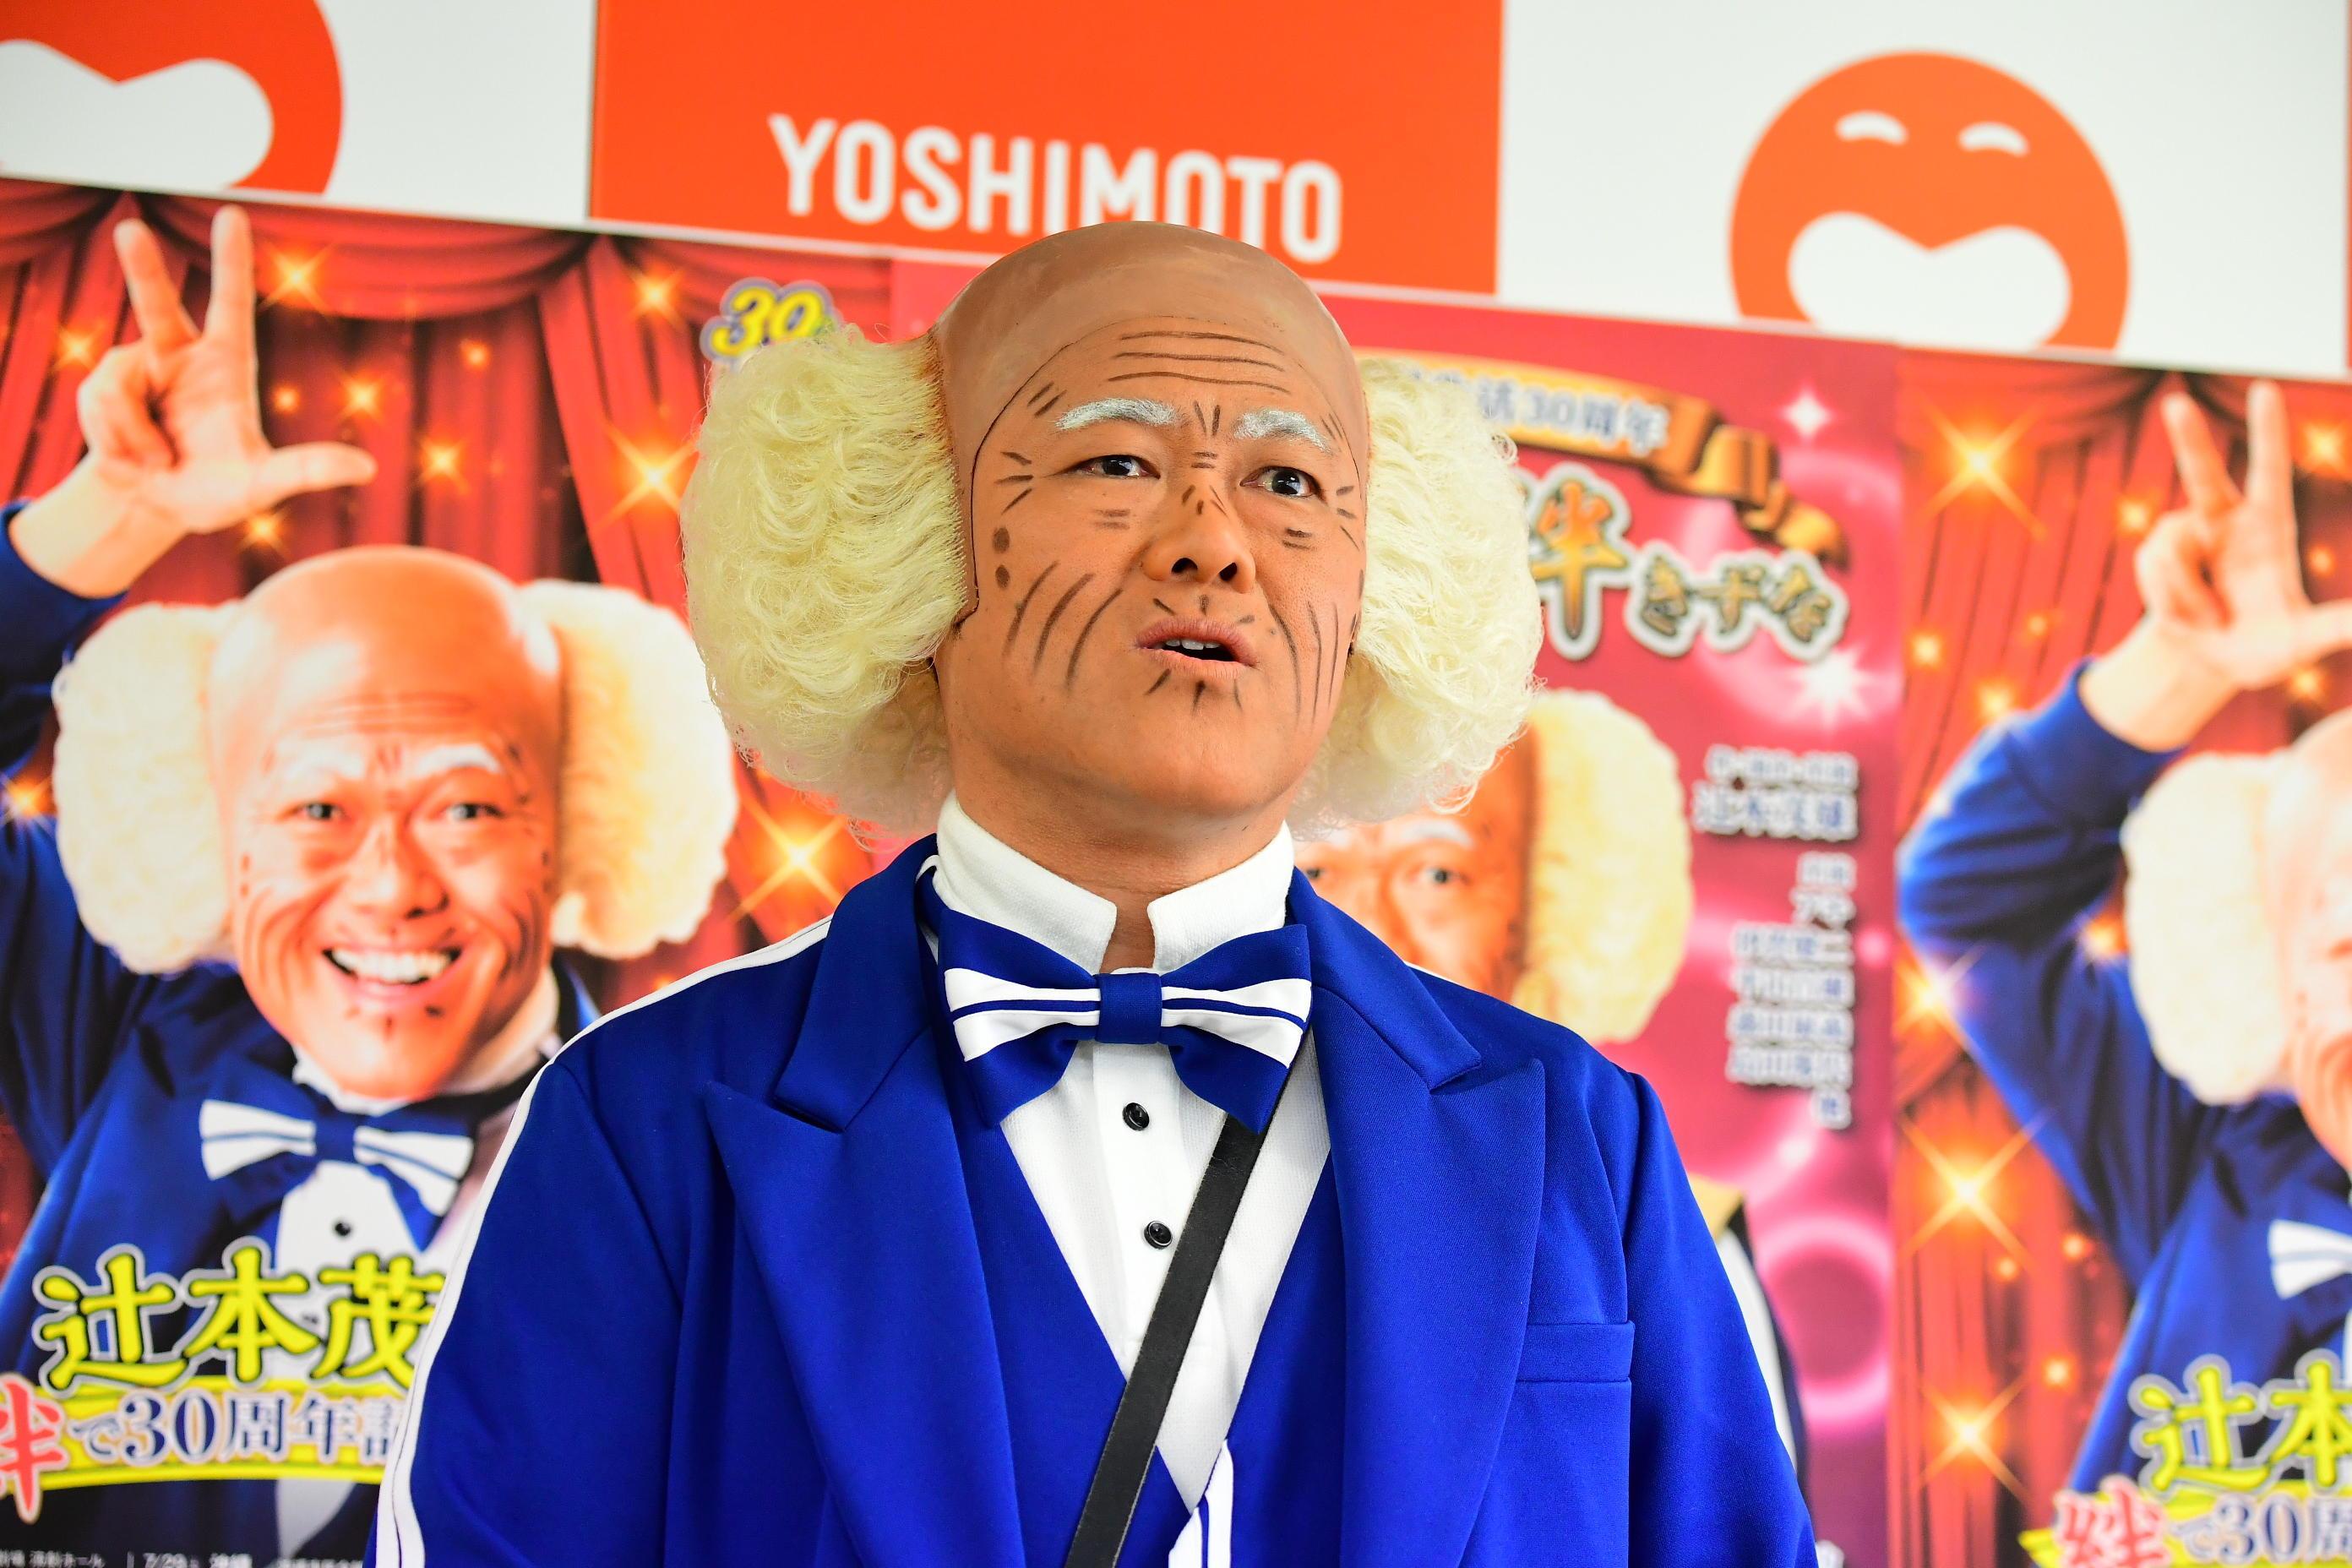 http://news.yoshimoto.co.jp/20170131181629-89b8c522e89cb2fa9dce10091654b09468dbf794.jpg